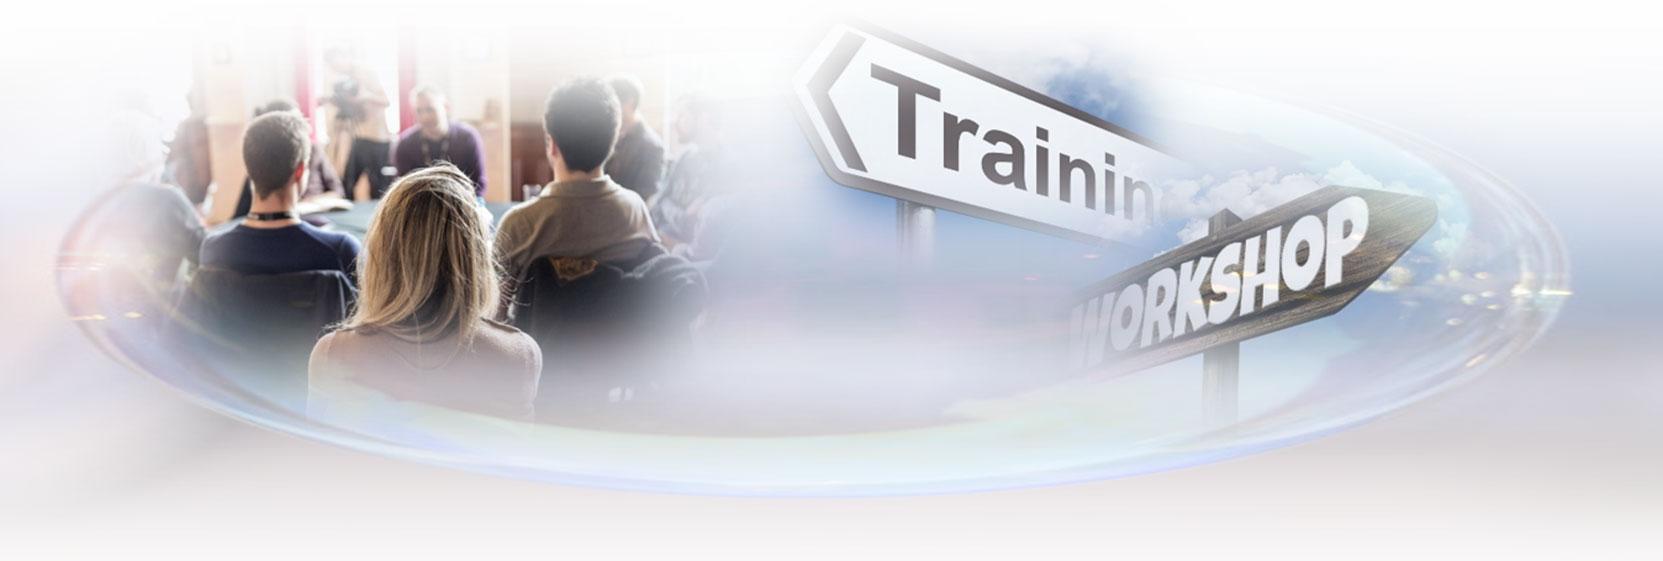 header voor training workshop of lezing